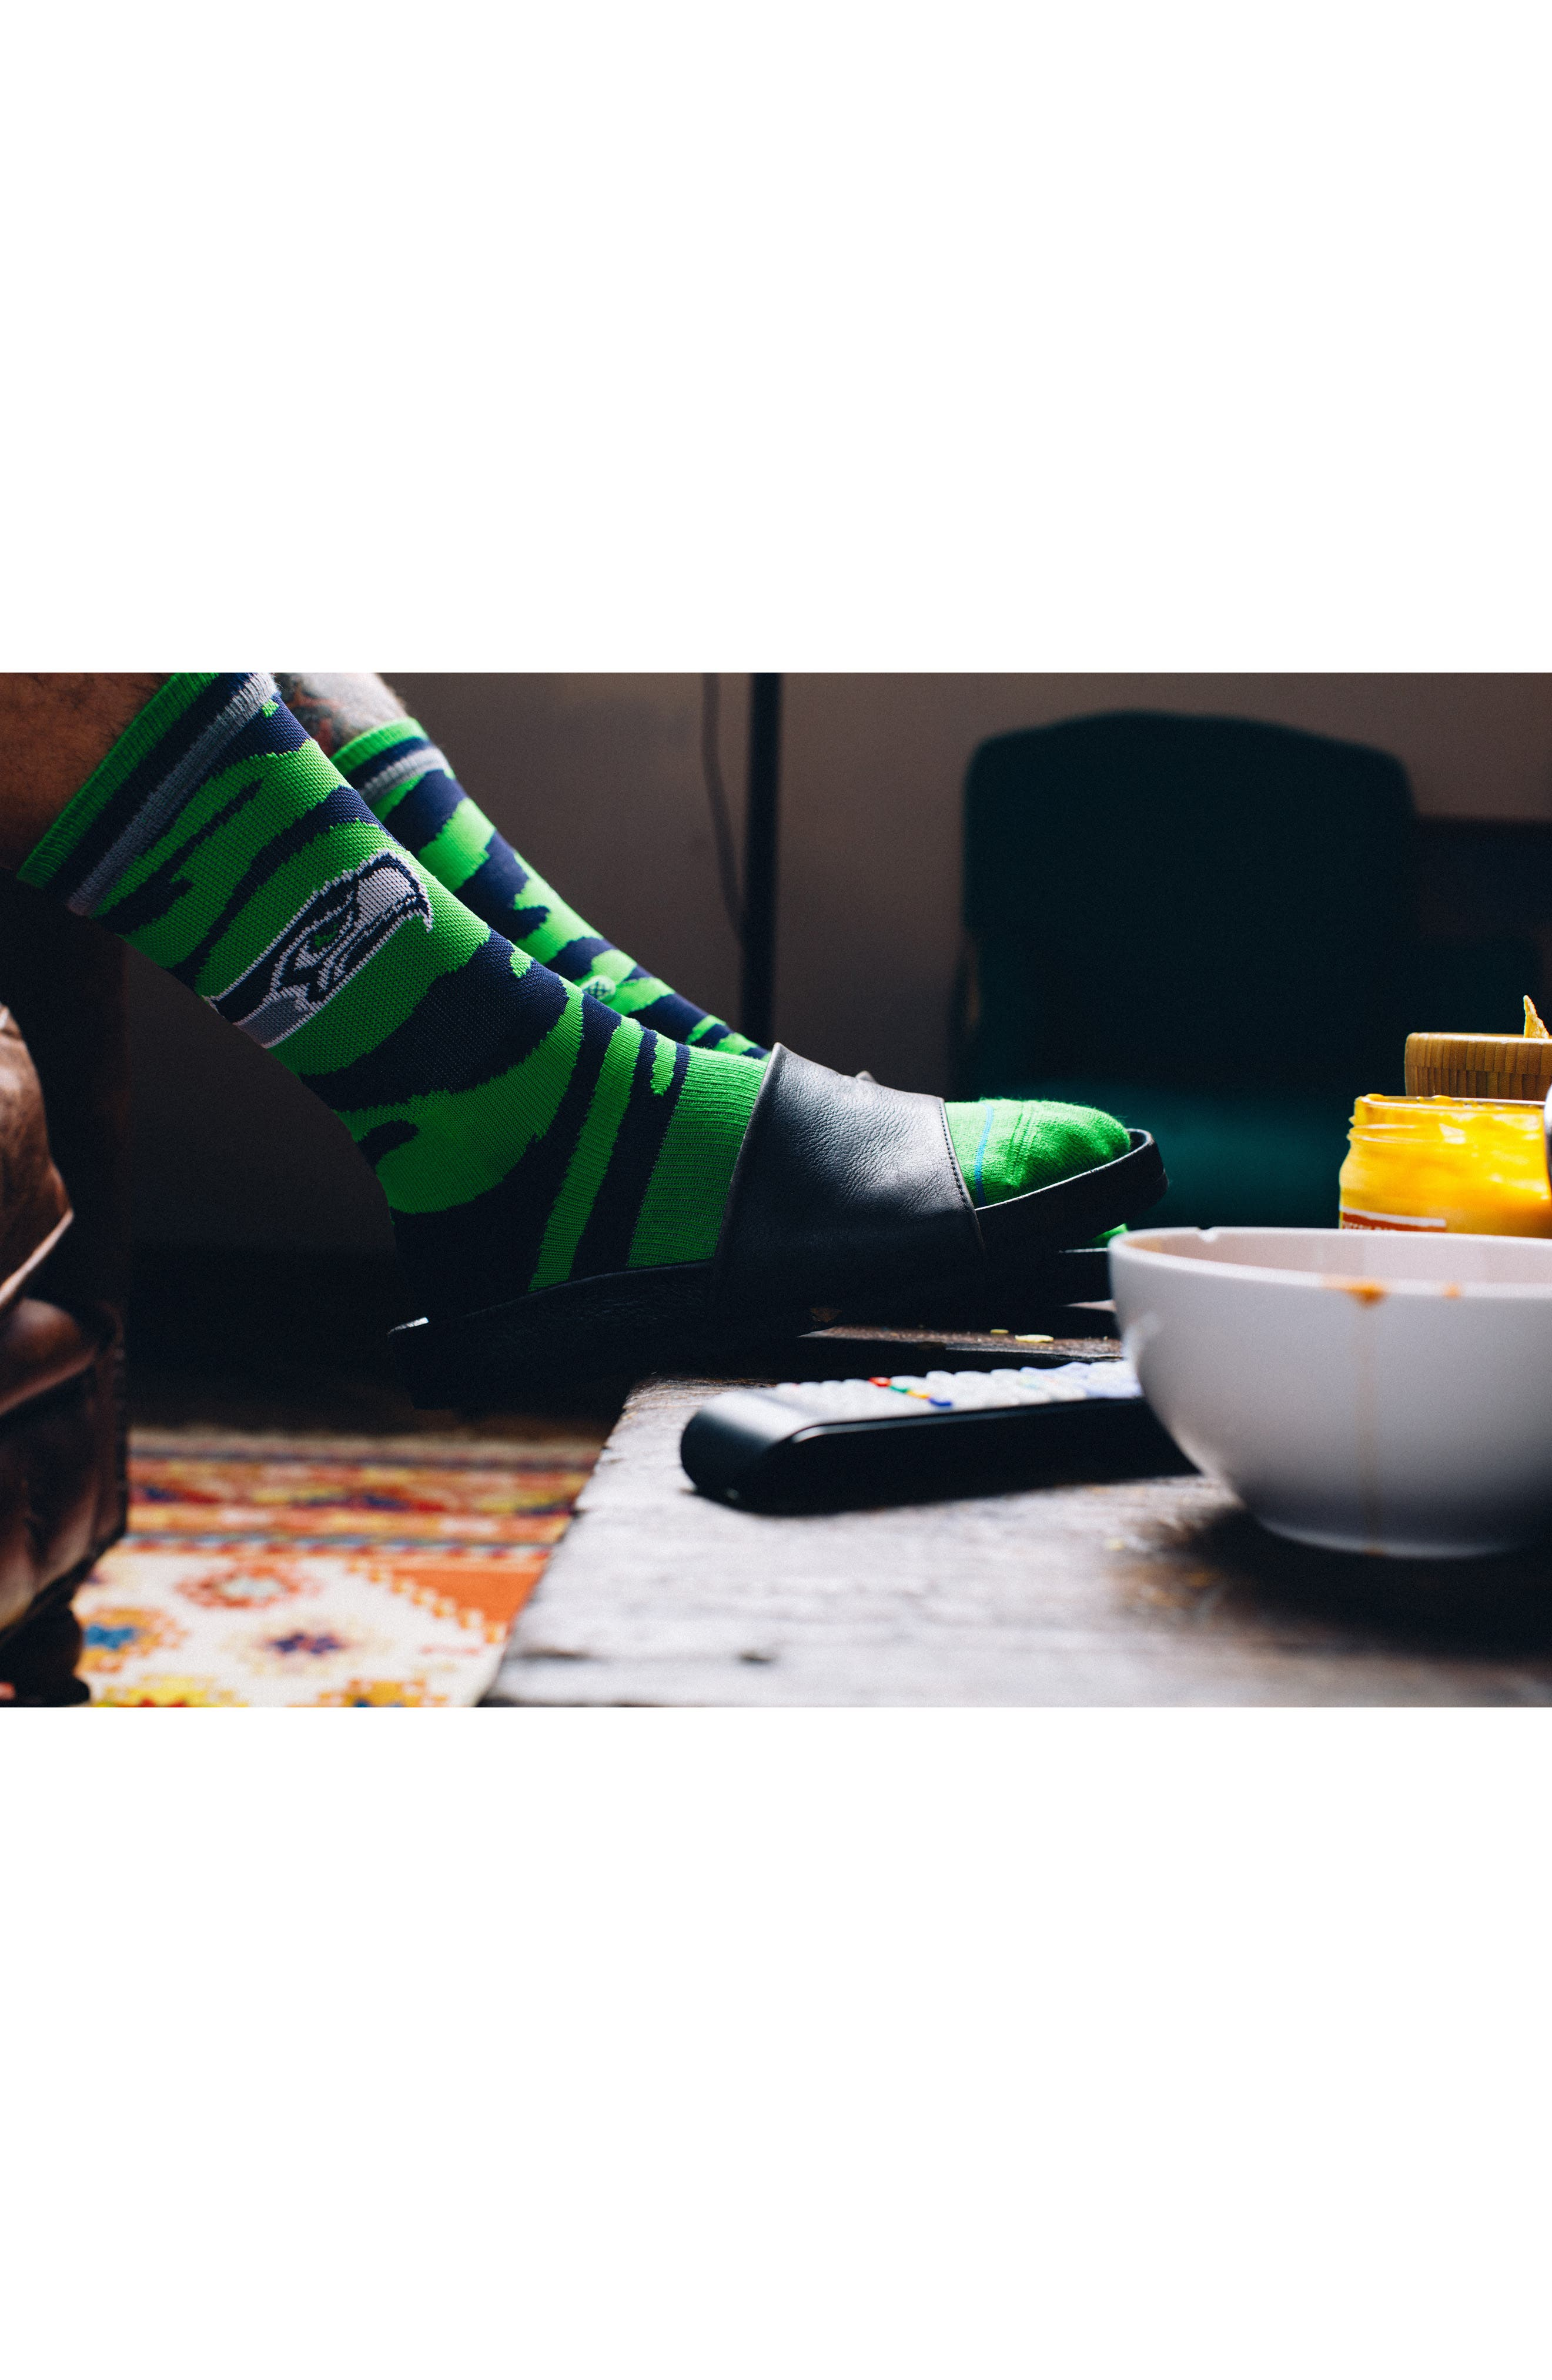 Seattle Seahawks - Fade Socks,                             Alternate thumbnail 4, color,                             300